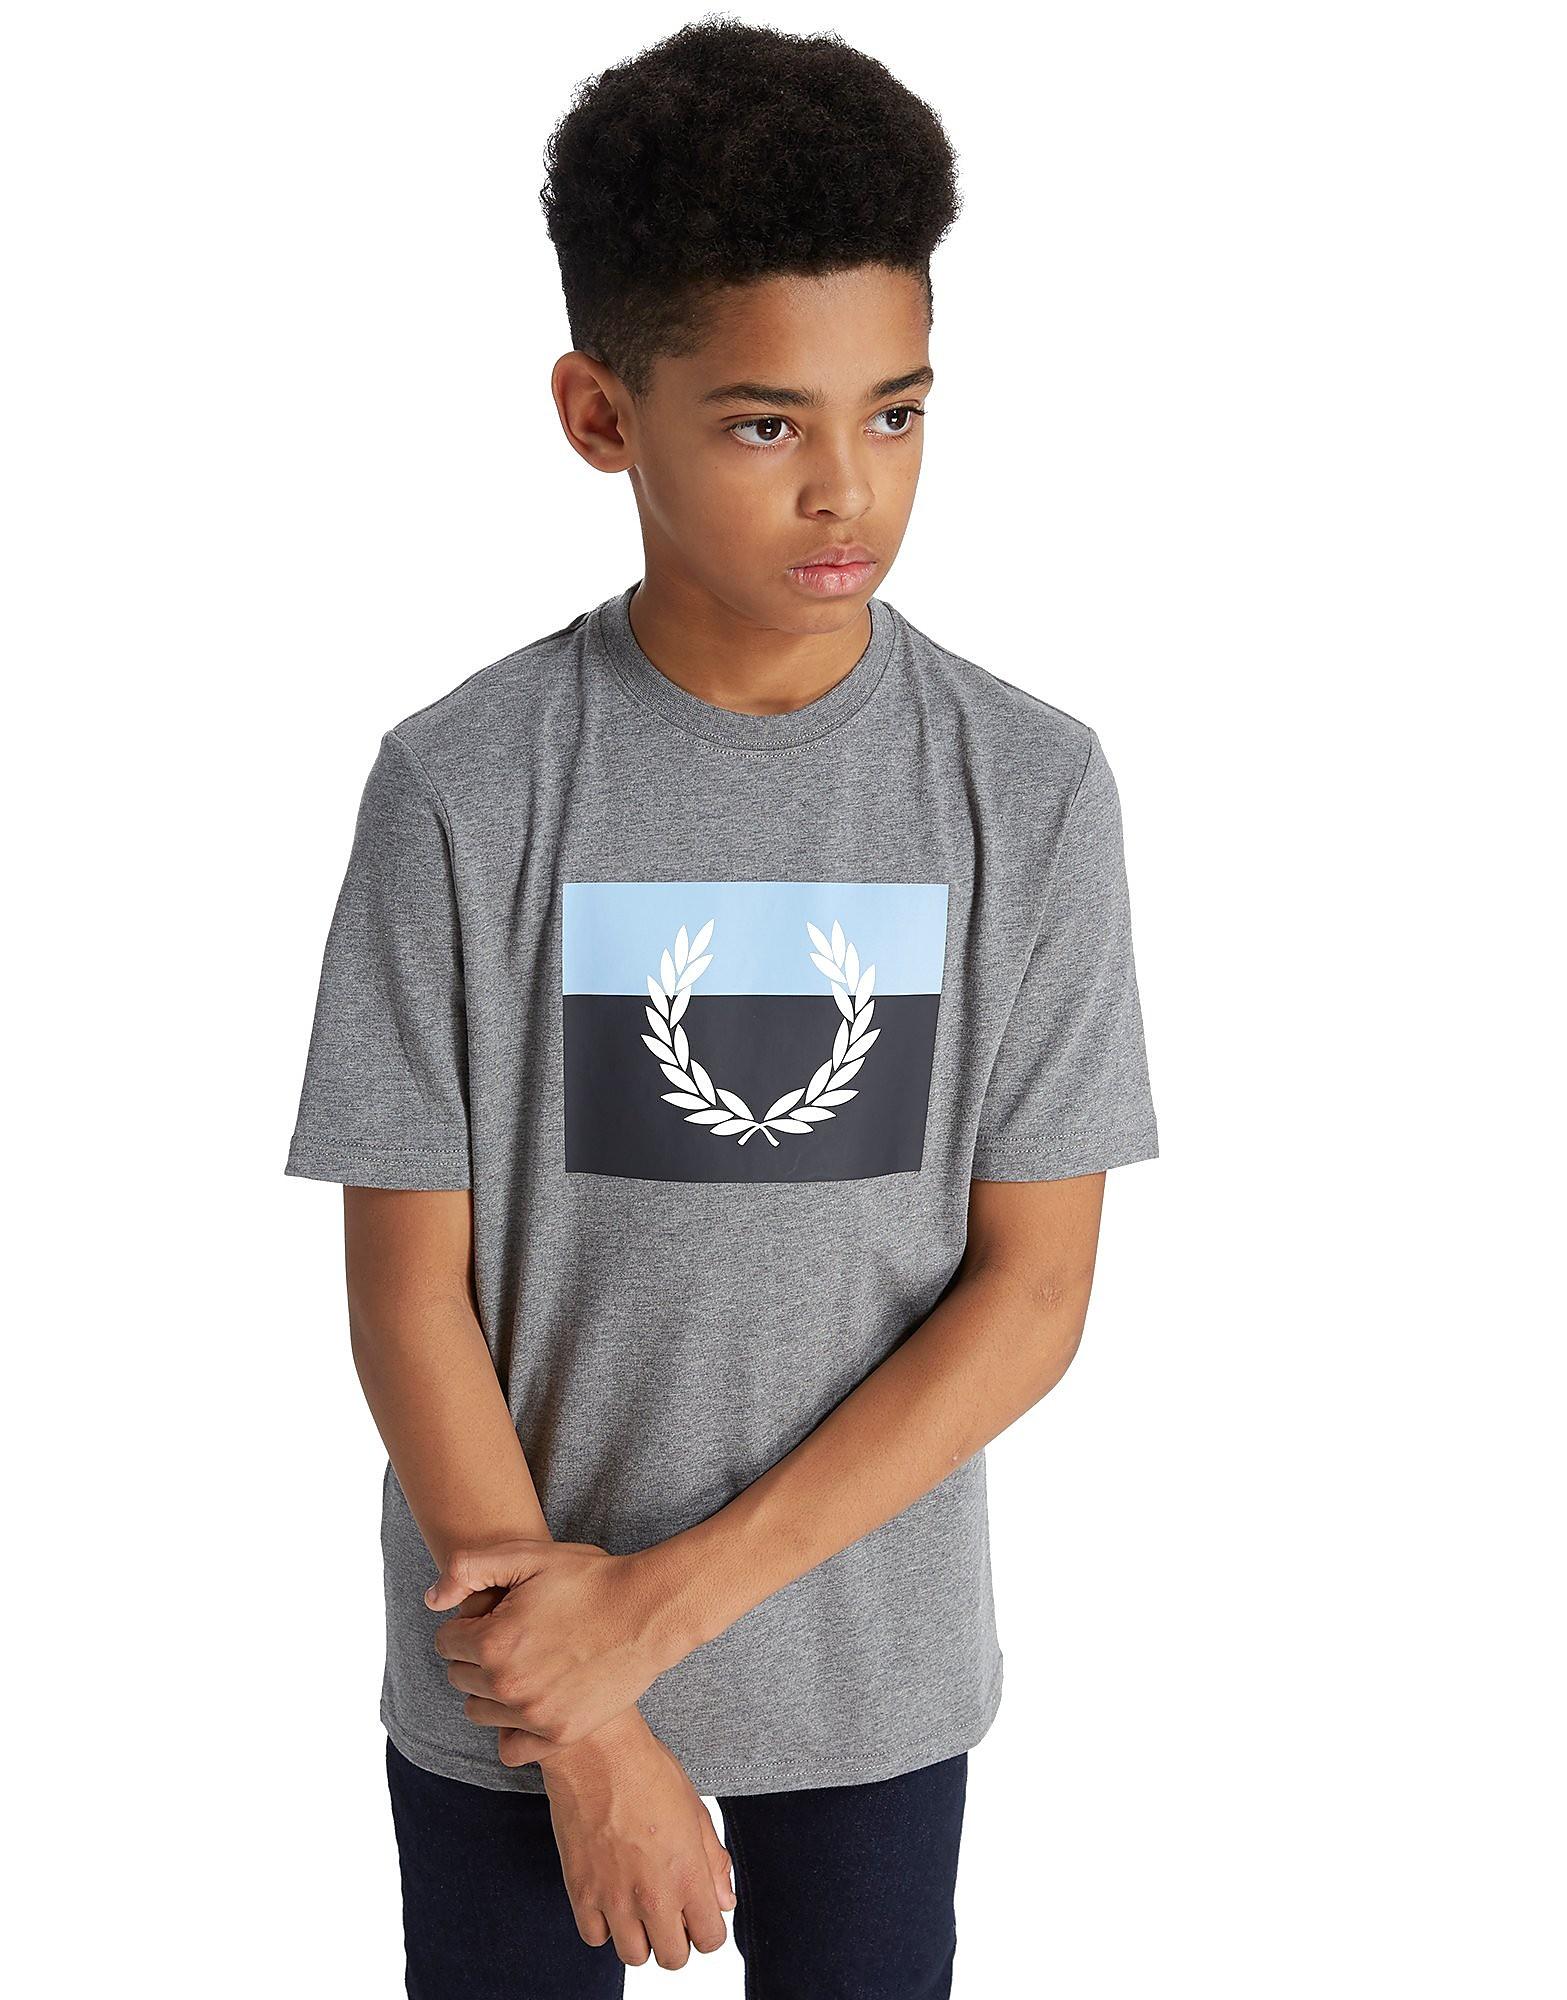 Fred Perry Large Laurel T-Shirt Junior Grijs Kind